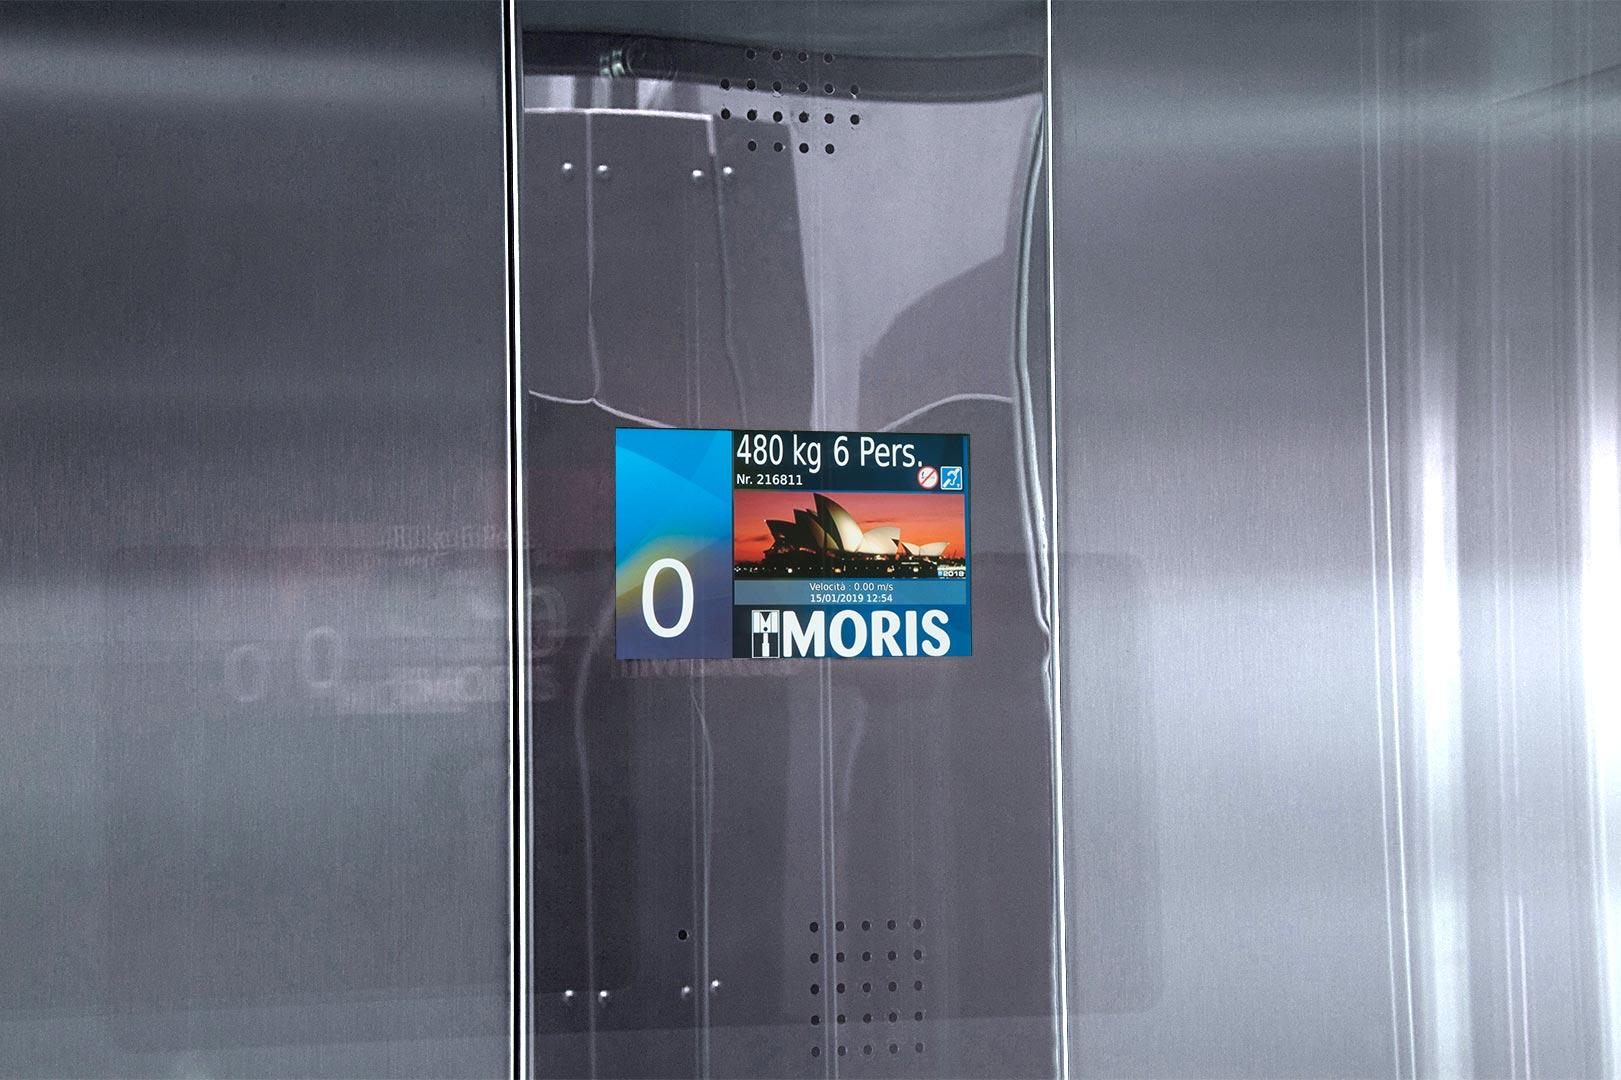 Moris gallery - complete installation